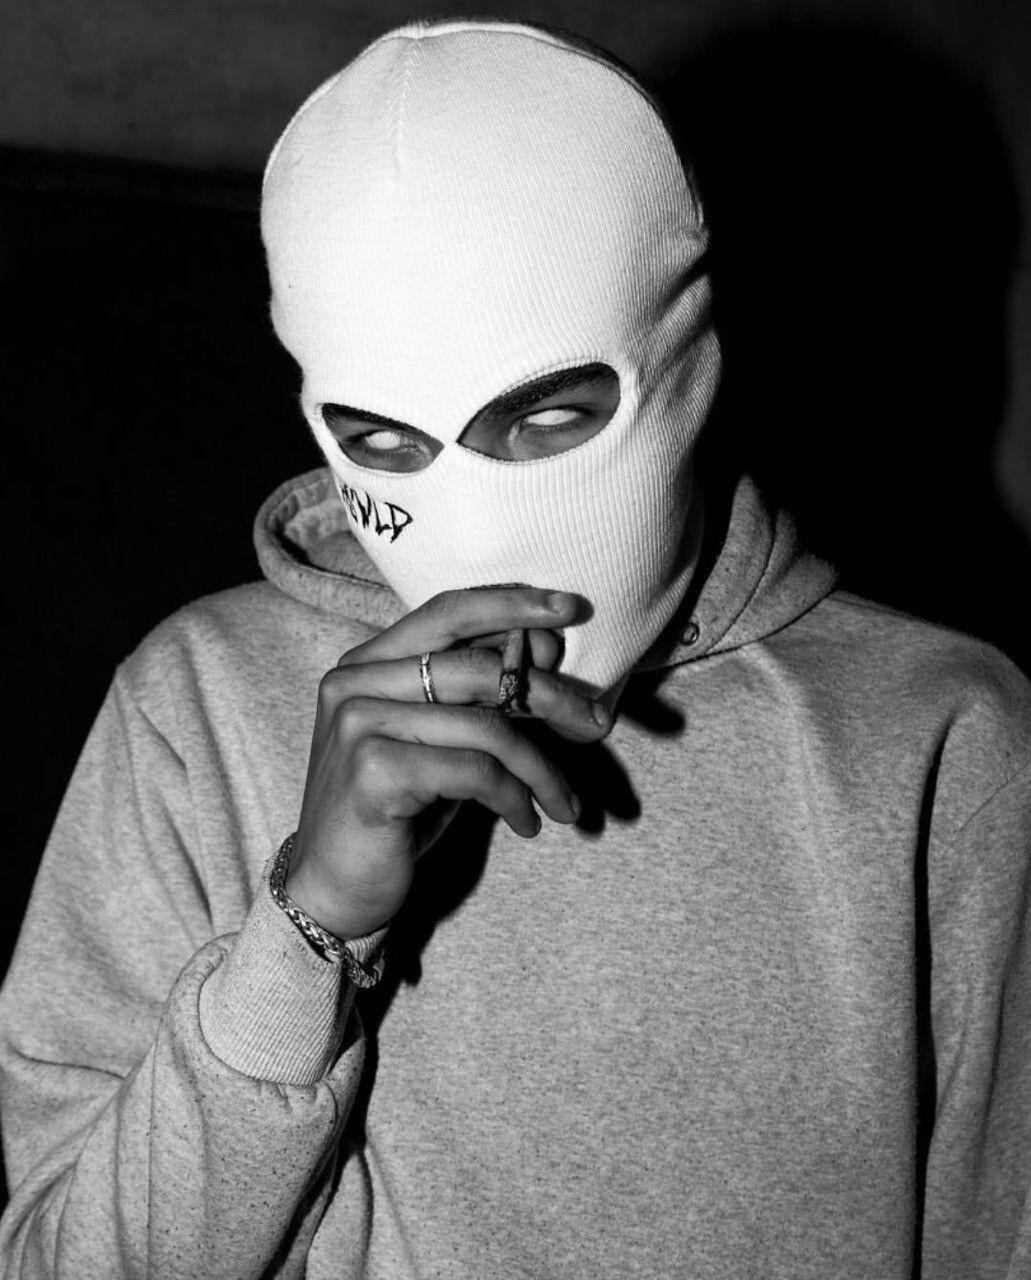 Pin by Wendy Miller on gangsta swag balaclava in 2019 Gangsta 1031x1280